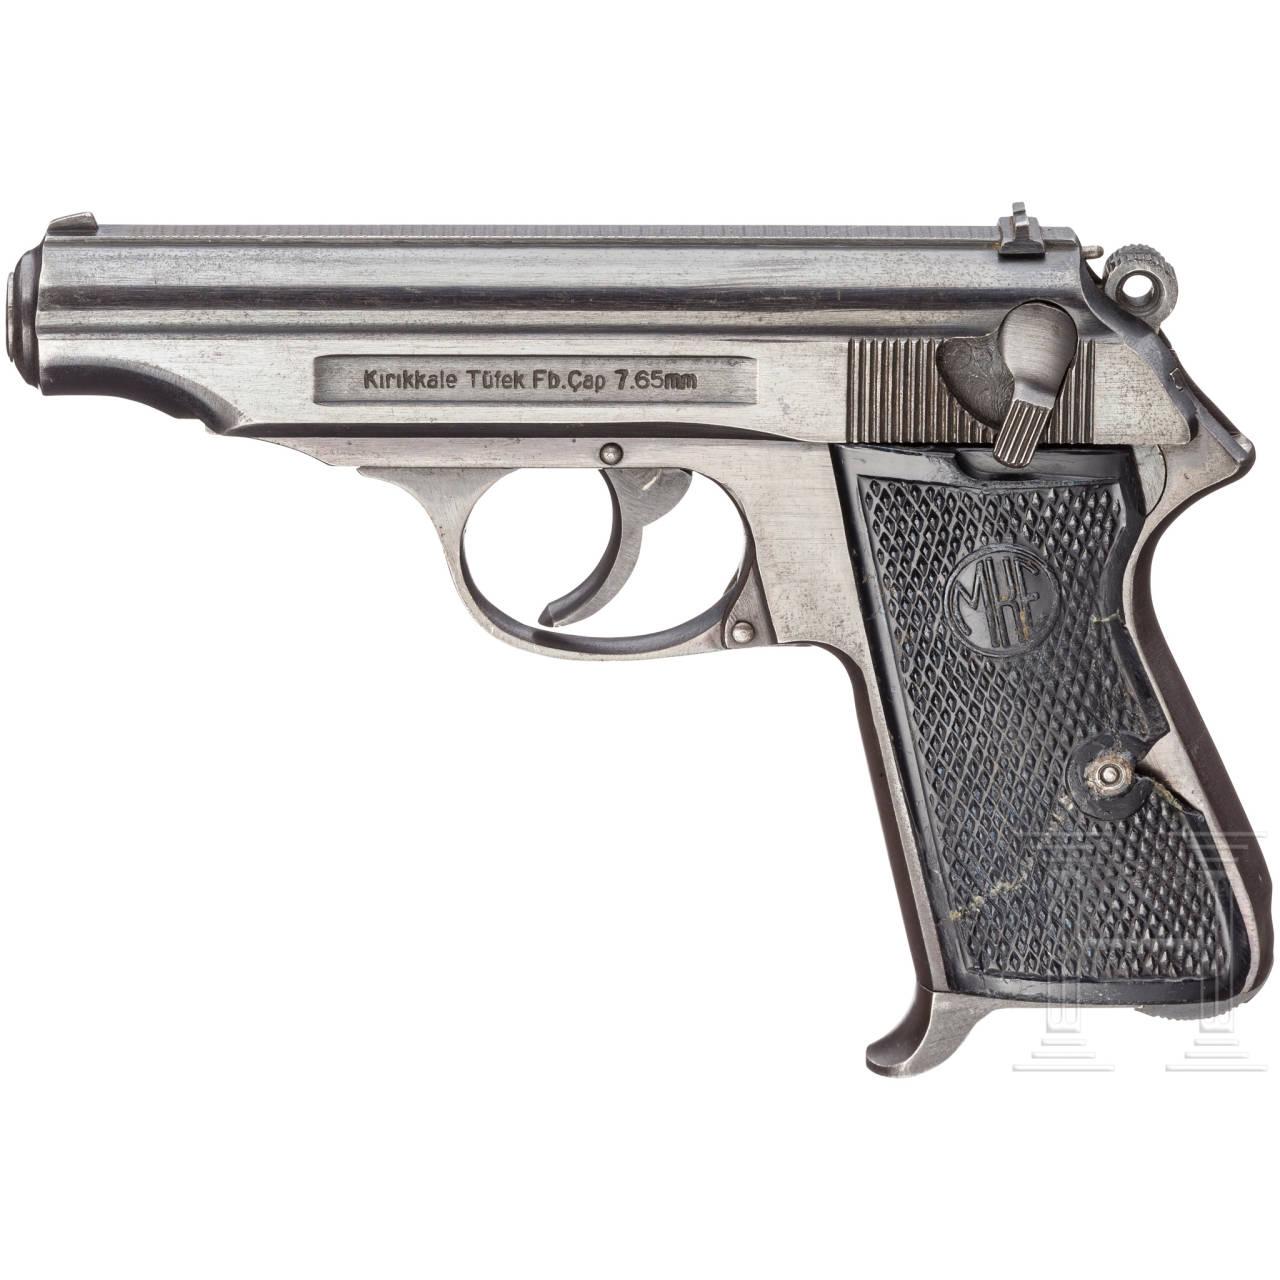 M.K.E. Kirikkale, Typ Walther PP